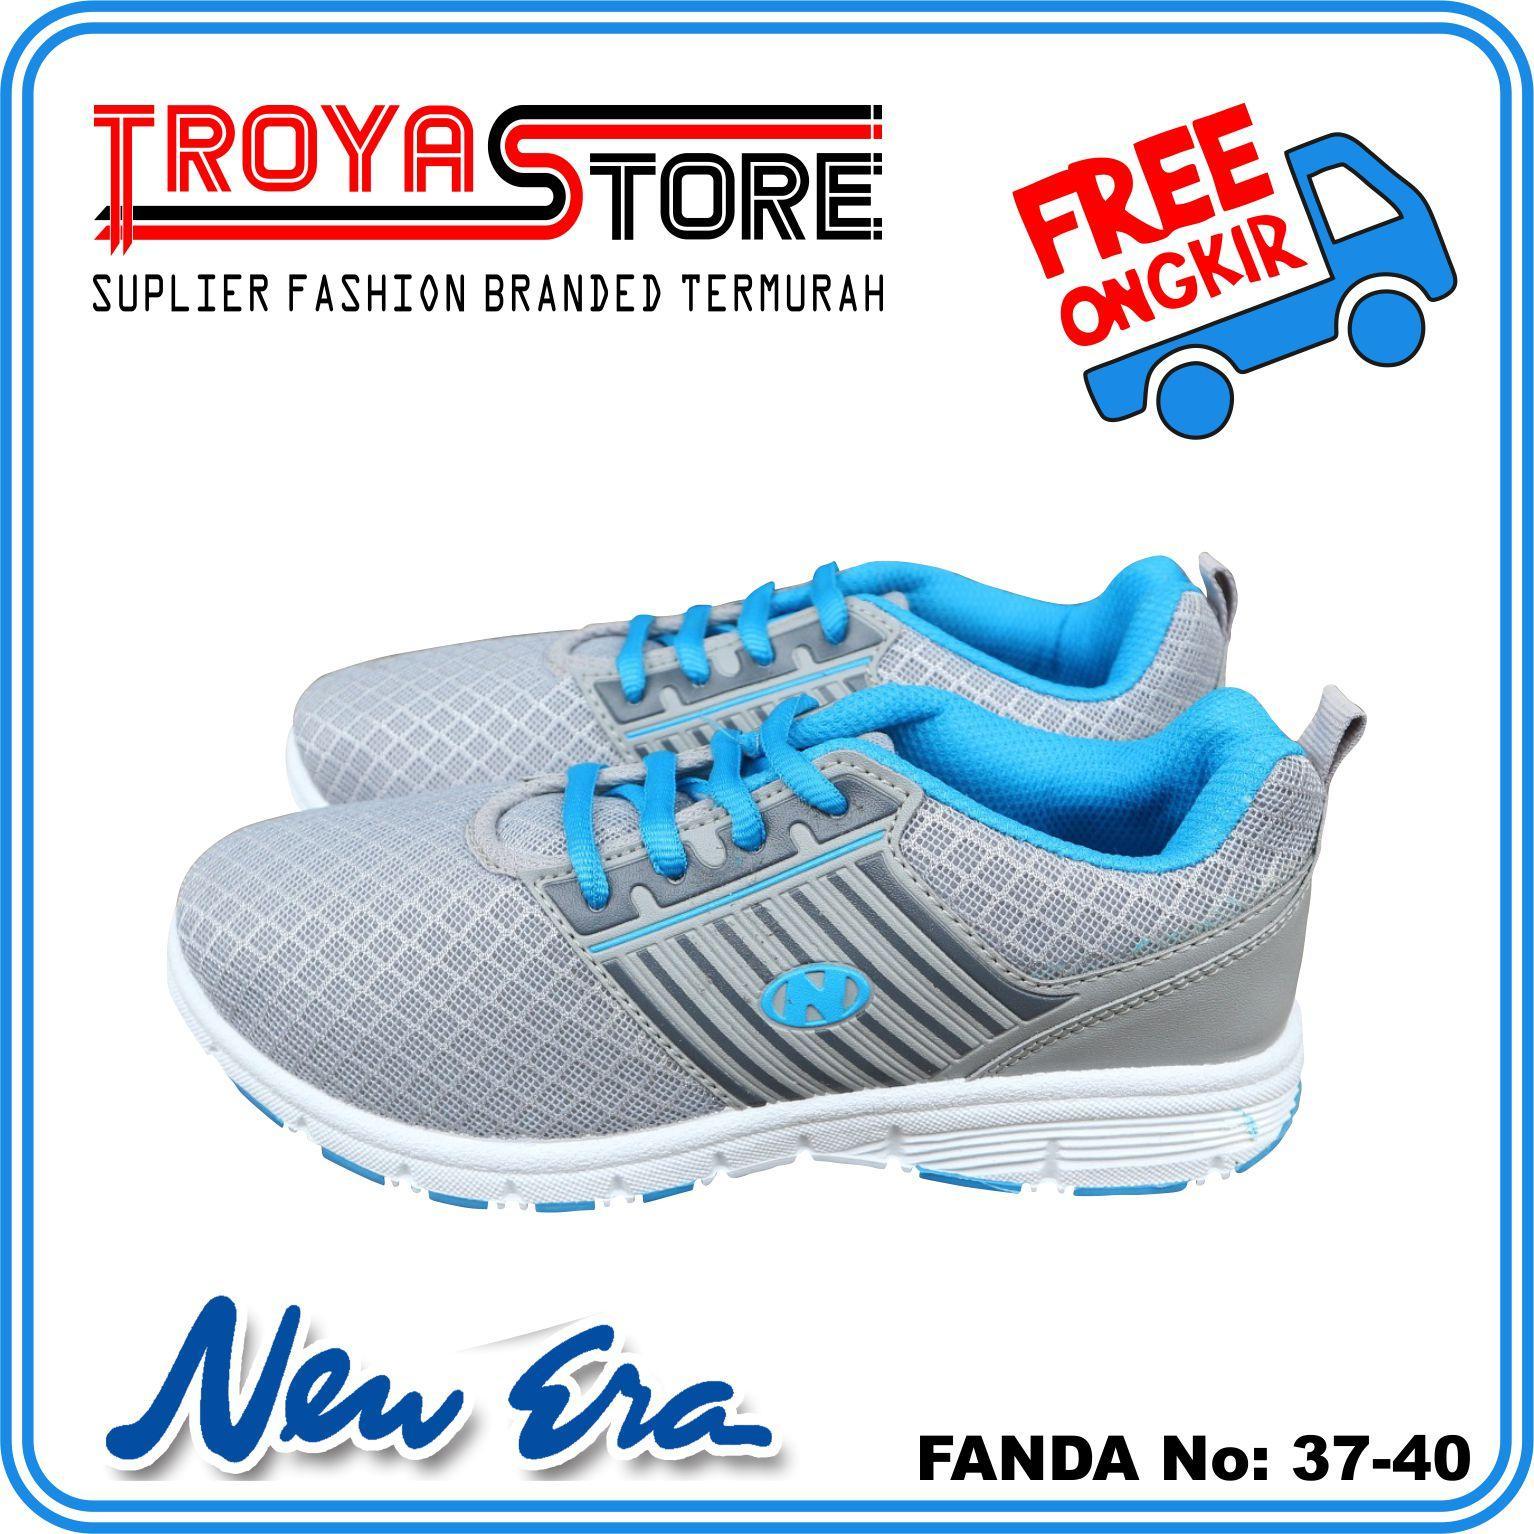 TROYASTORE - NEW ERA Sepatu Wanita Murah FANDA Original   Sepatu Sport  Wanita Abu Hijau Orange fd33ed5680